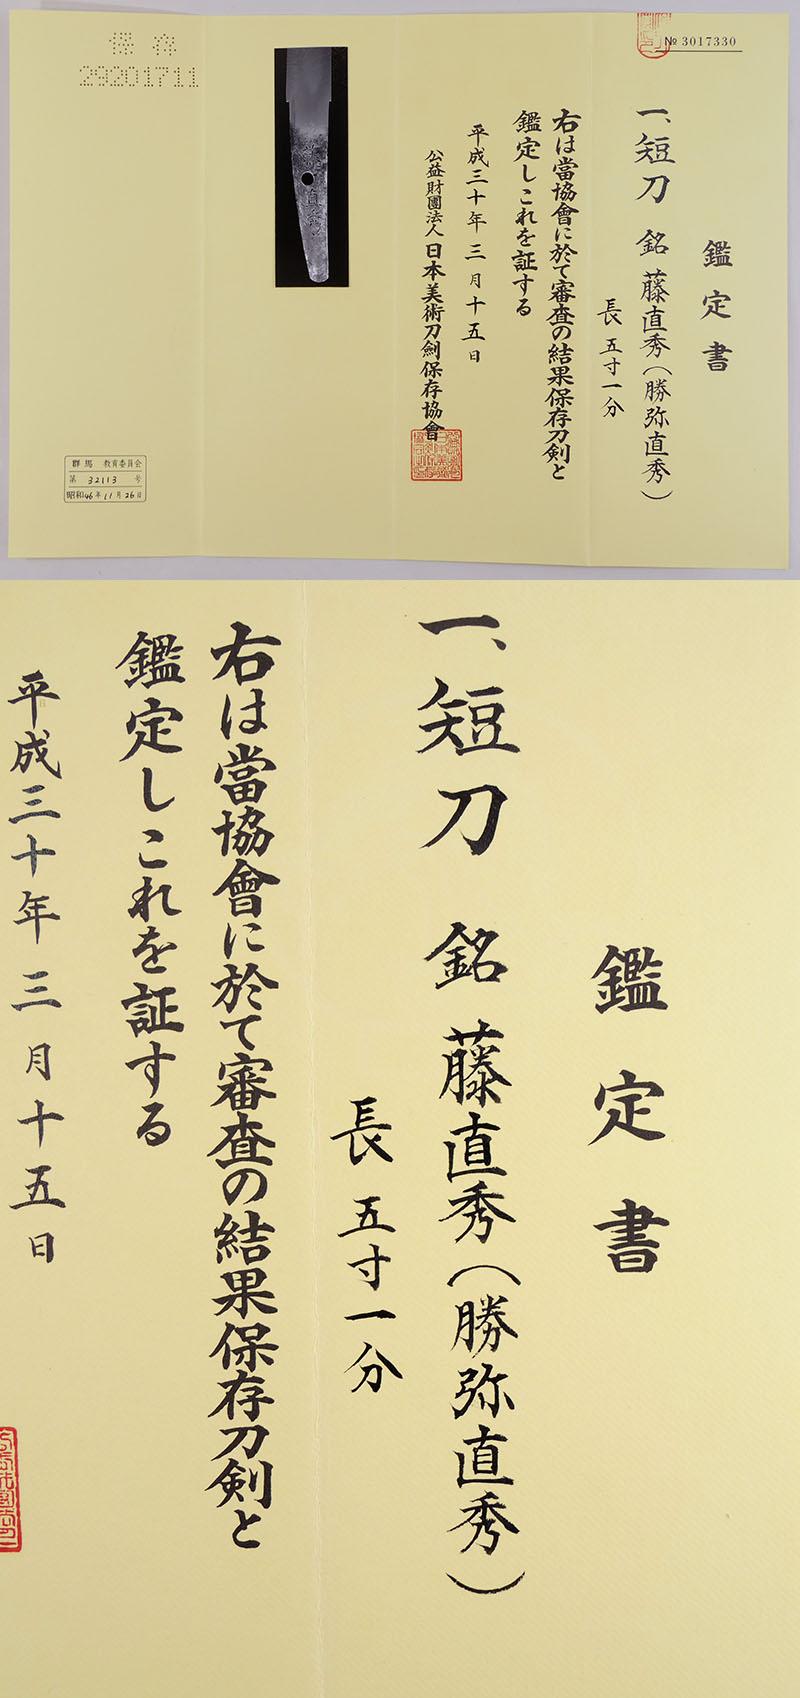 藤直秀(勝弥直秀) Picture of Certificate